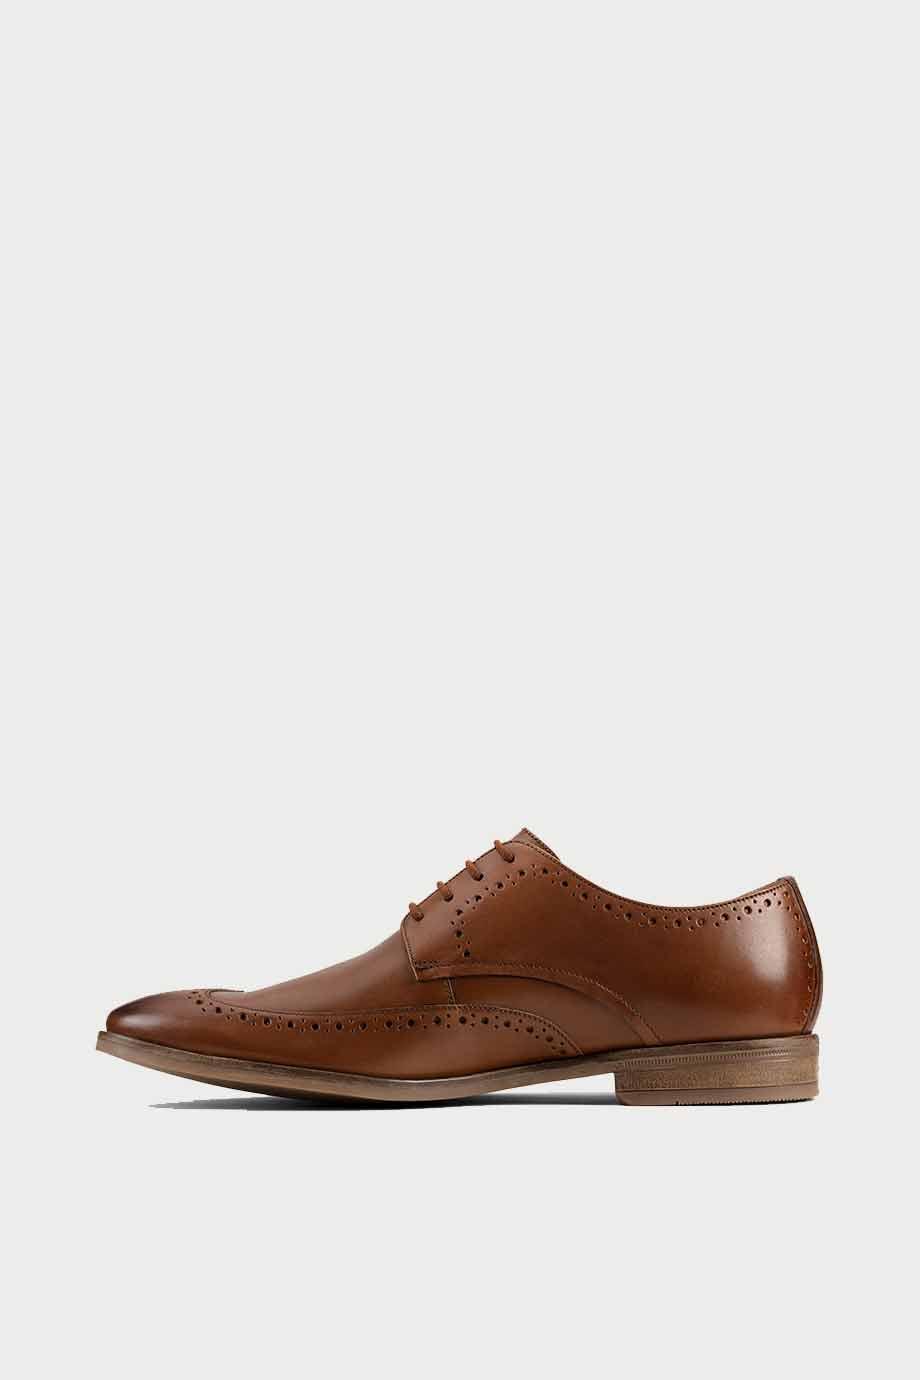 spiridoula metheniti shoes xalkida p Stanford Limit clarks tan leather 4